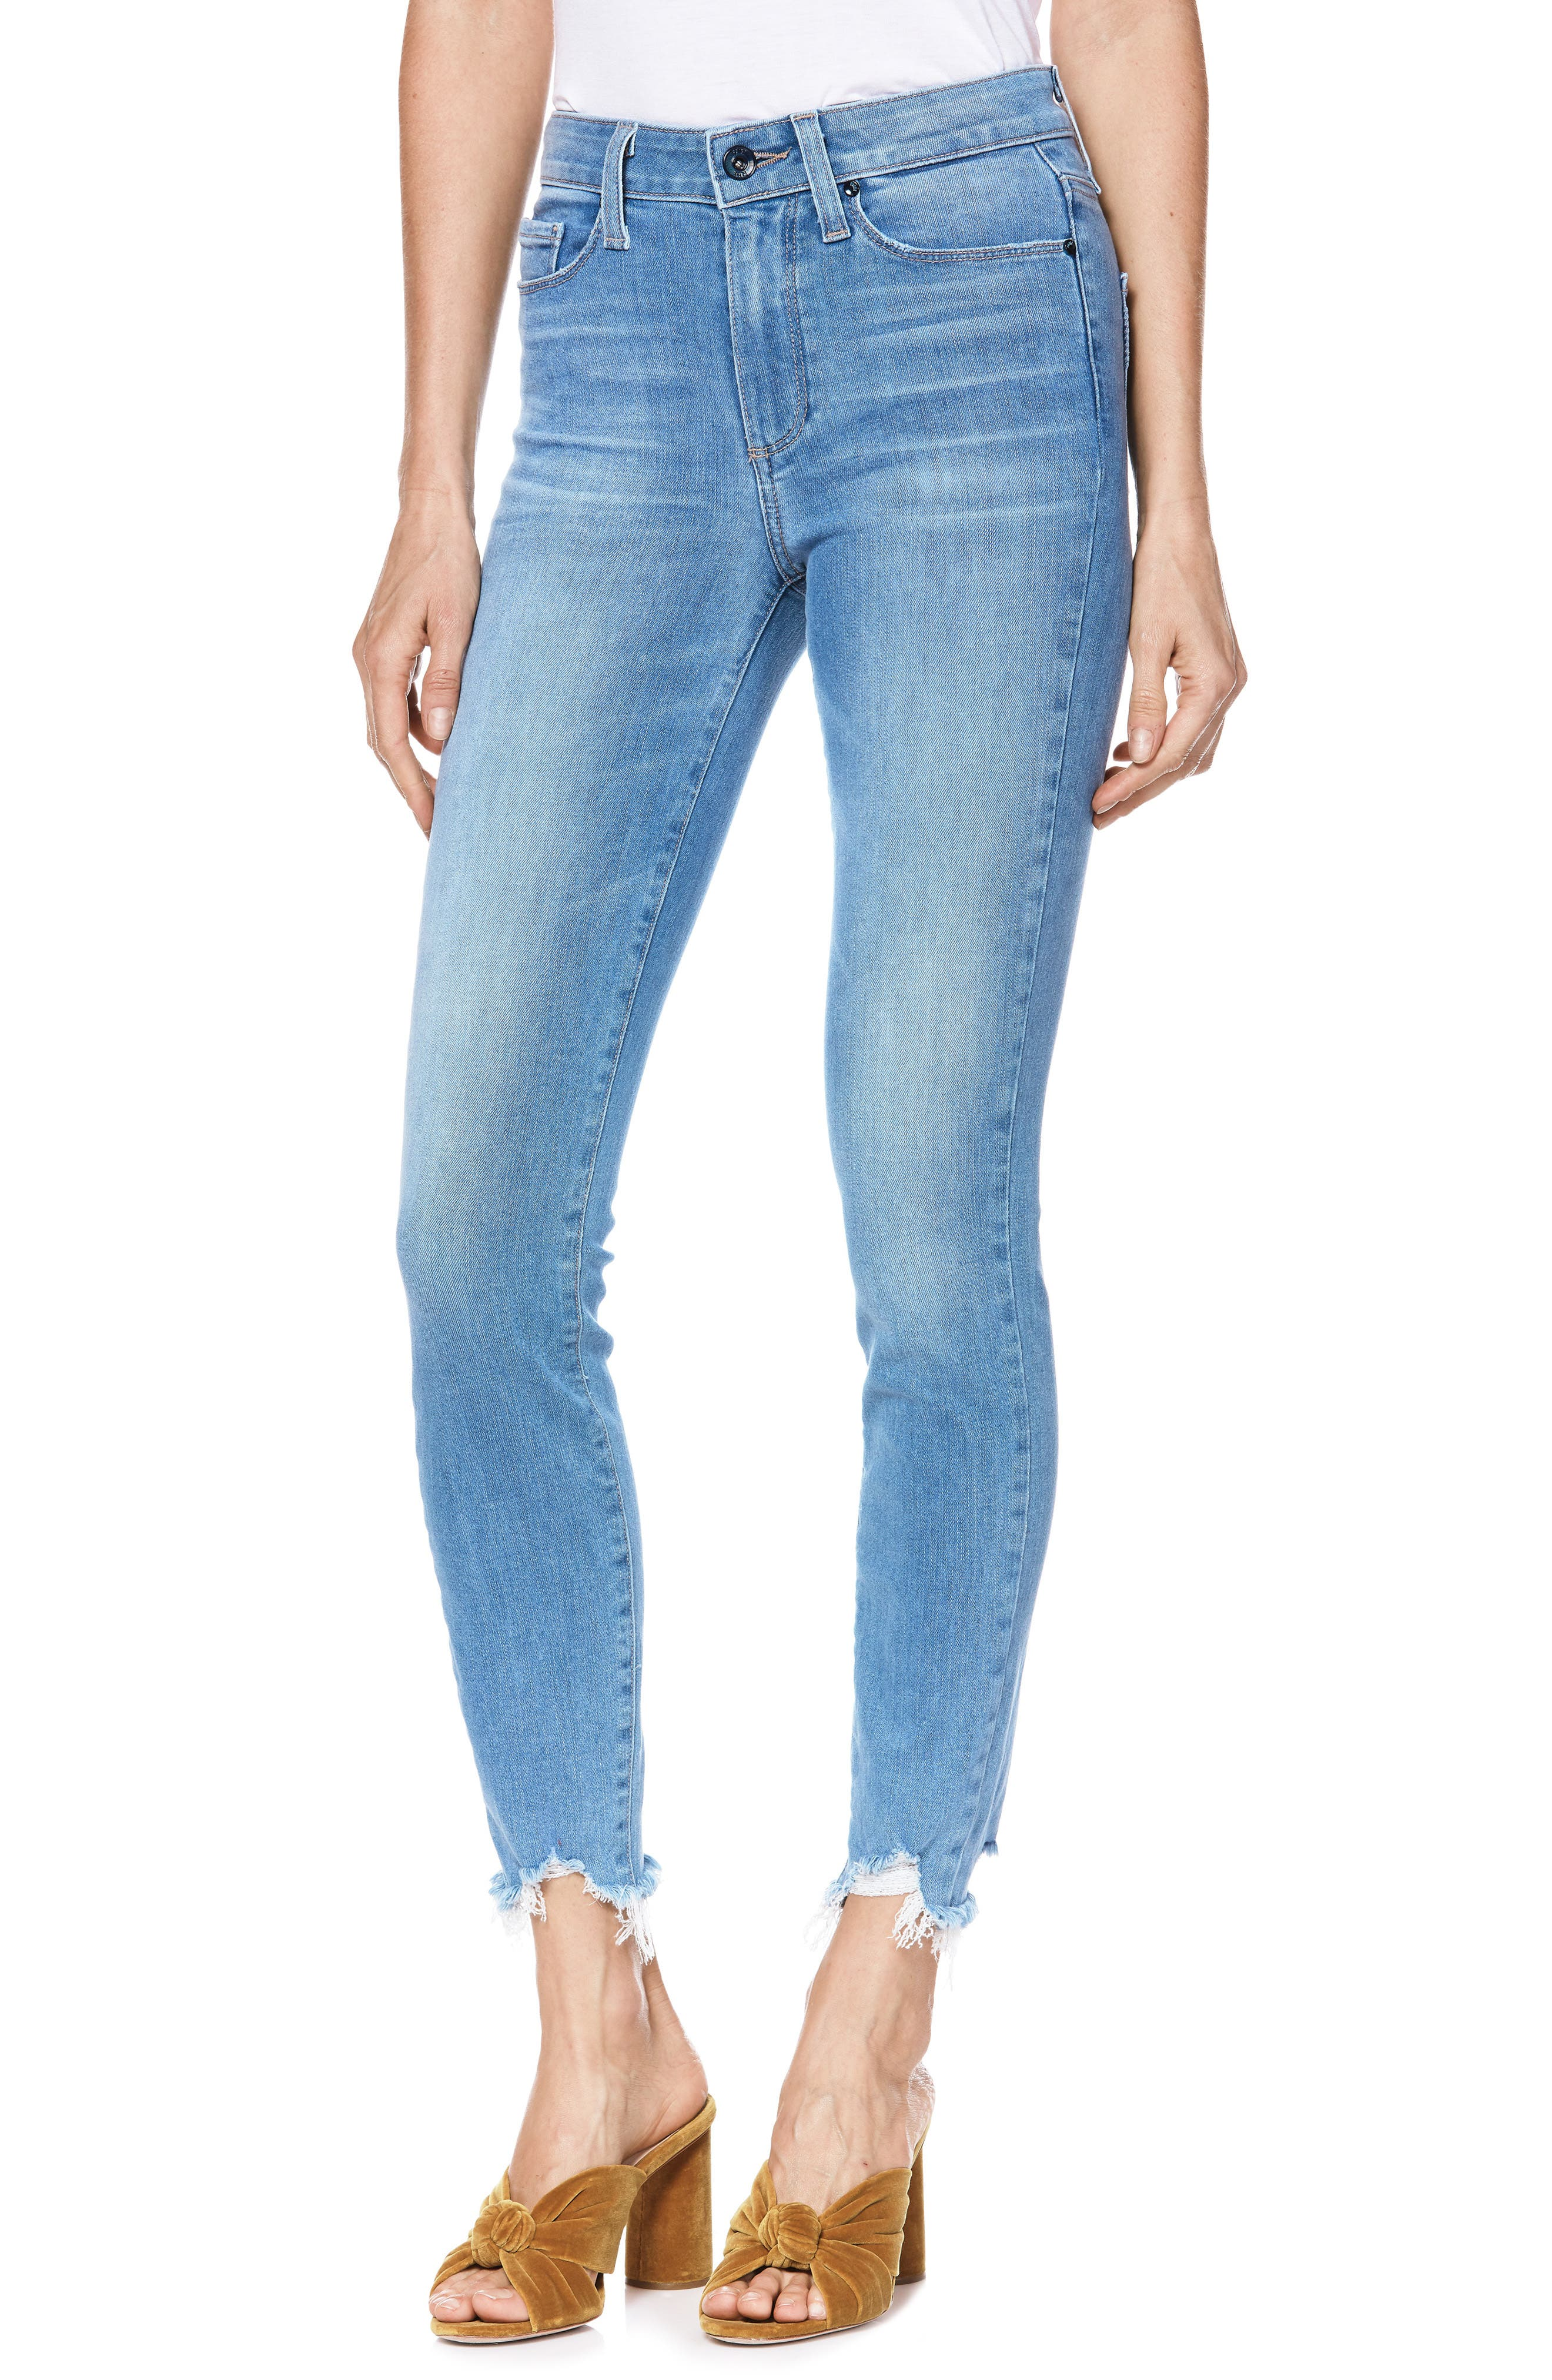 Transcend Vintage - Hoxton High Waist Ripped Crop Skinny Jeans,                         Main,                         color, ALAMEDA